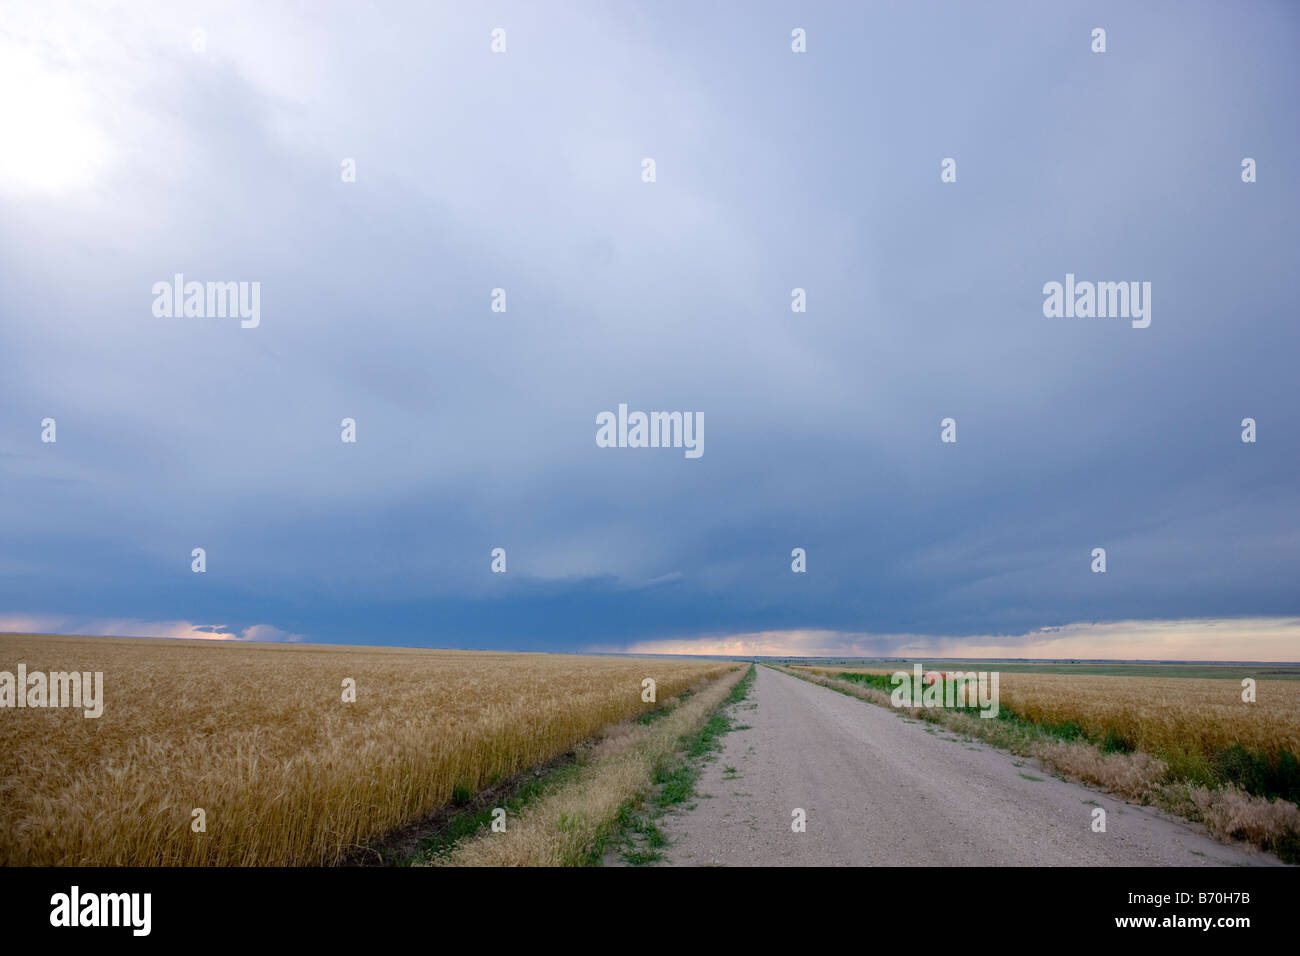 Road and wheat field in Wakeeney Kansas Stock Photo